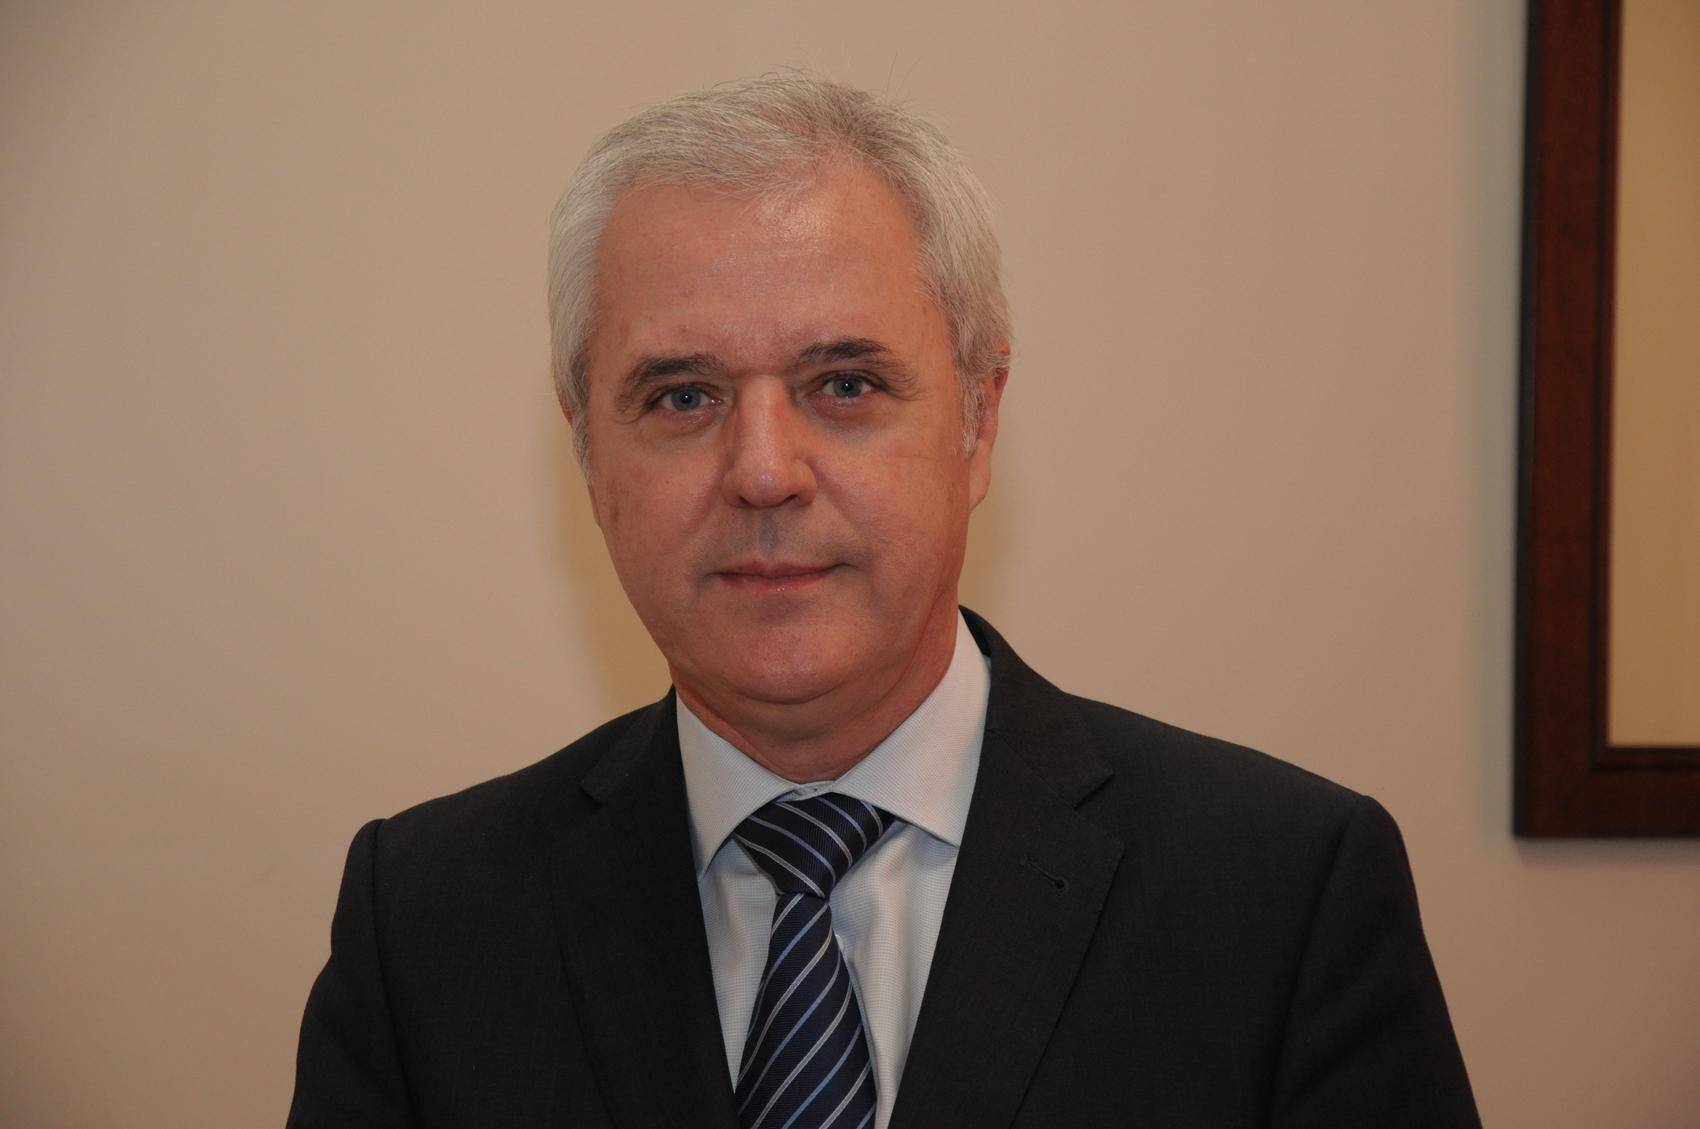 José Fernando Sánchez Bódalo